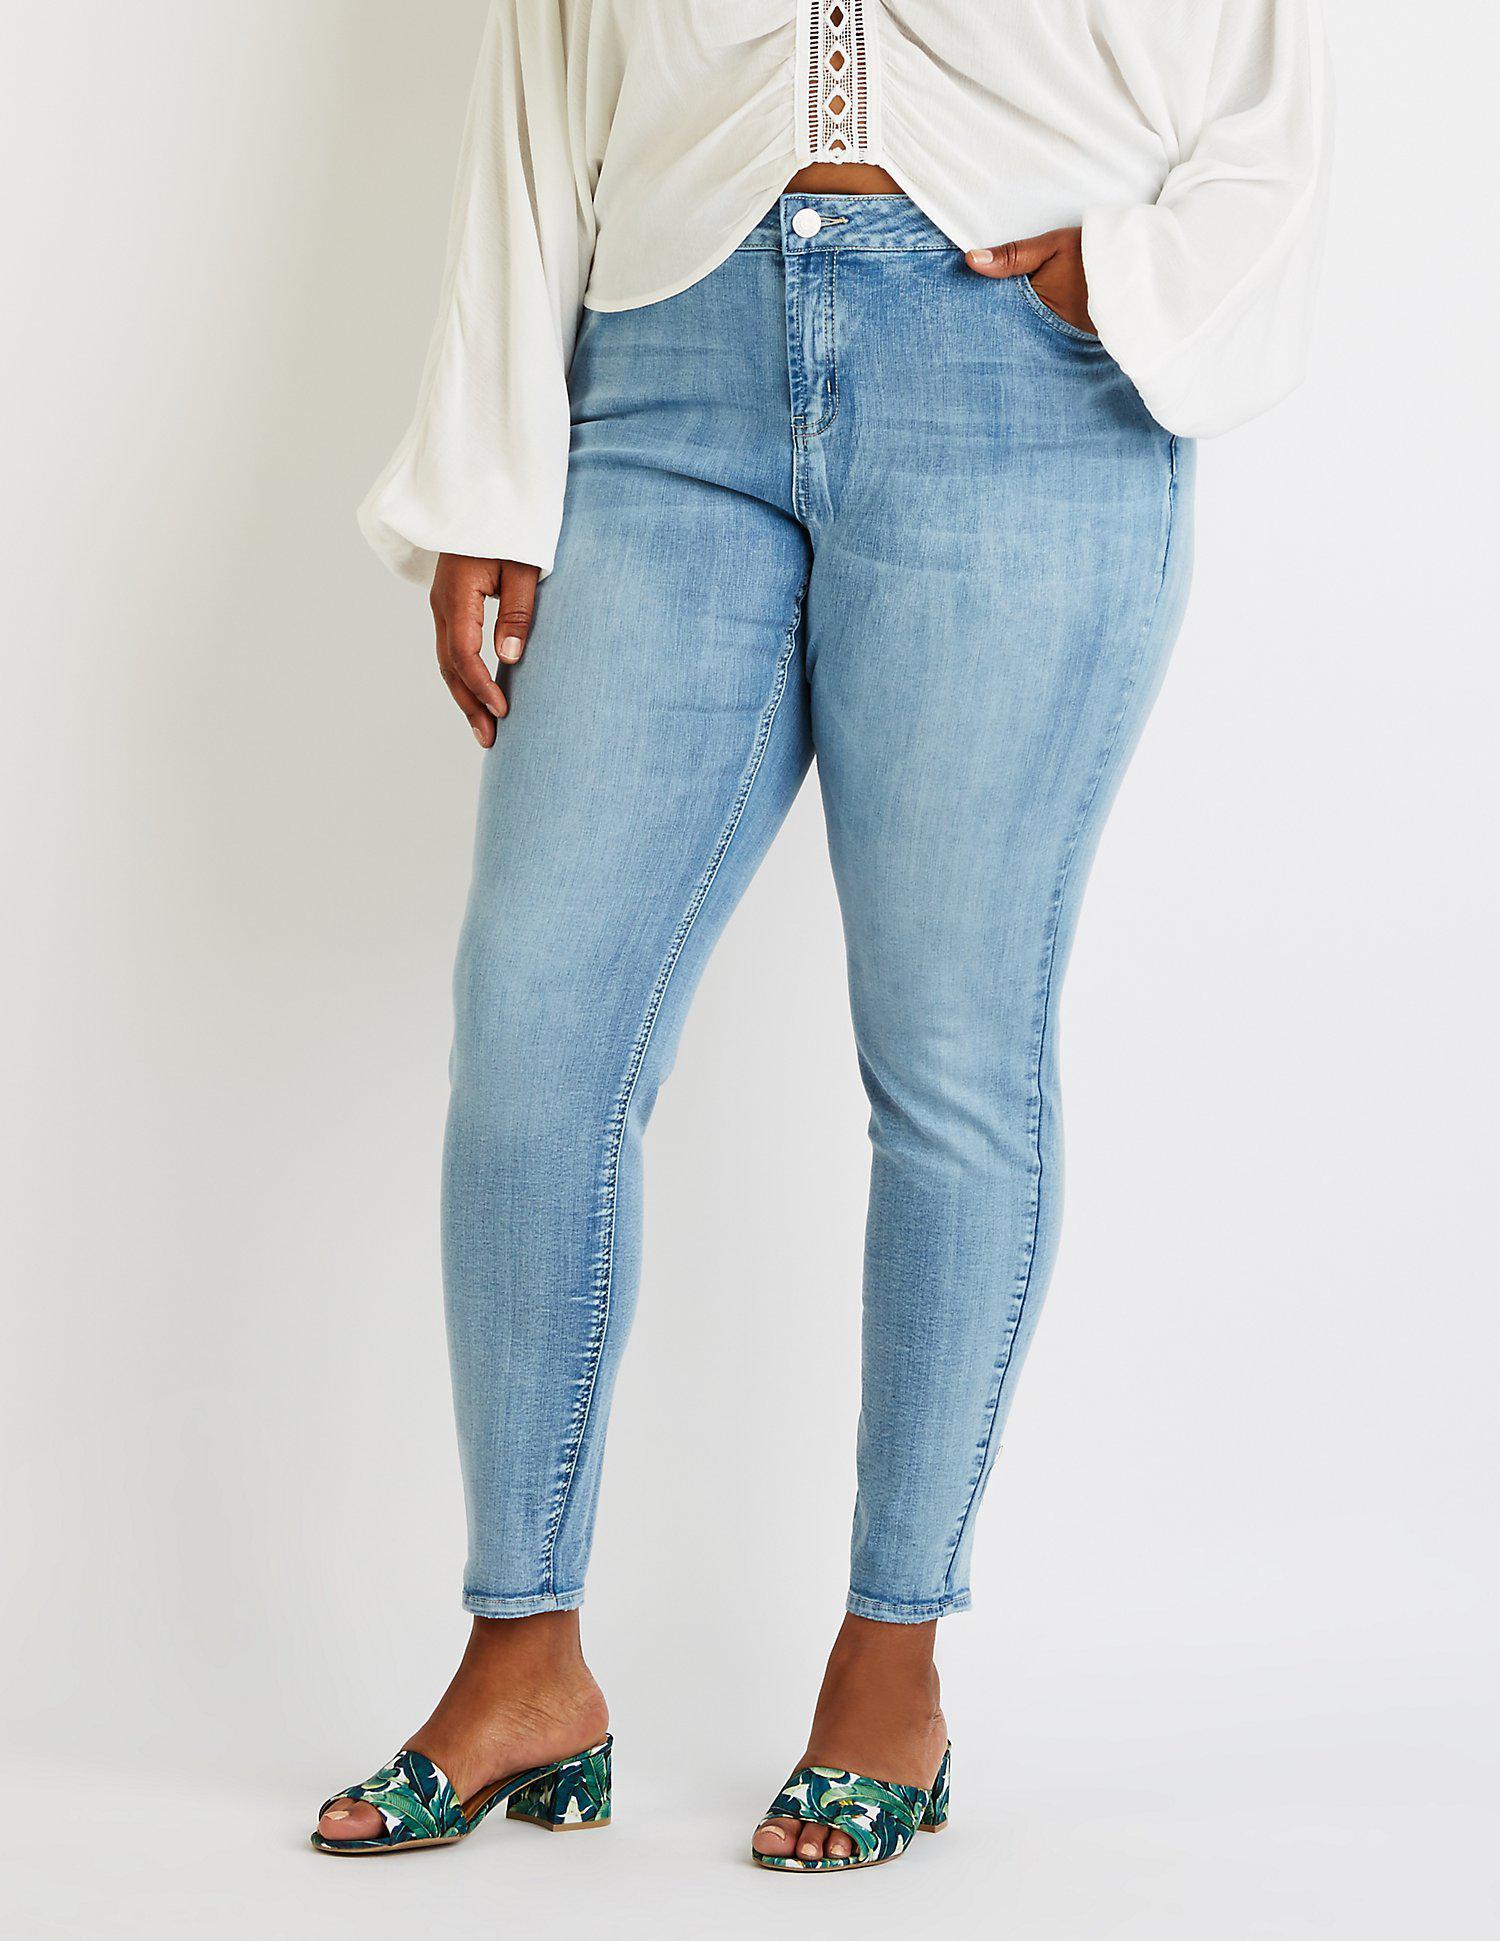 787dd1957 Lyst - Charlotte Russe Plus Size Refuge Destroyed Boyfriend Jeans in ...